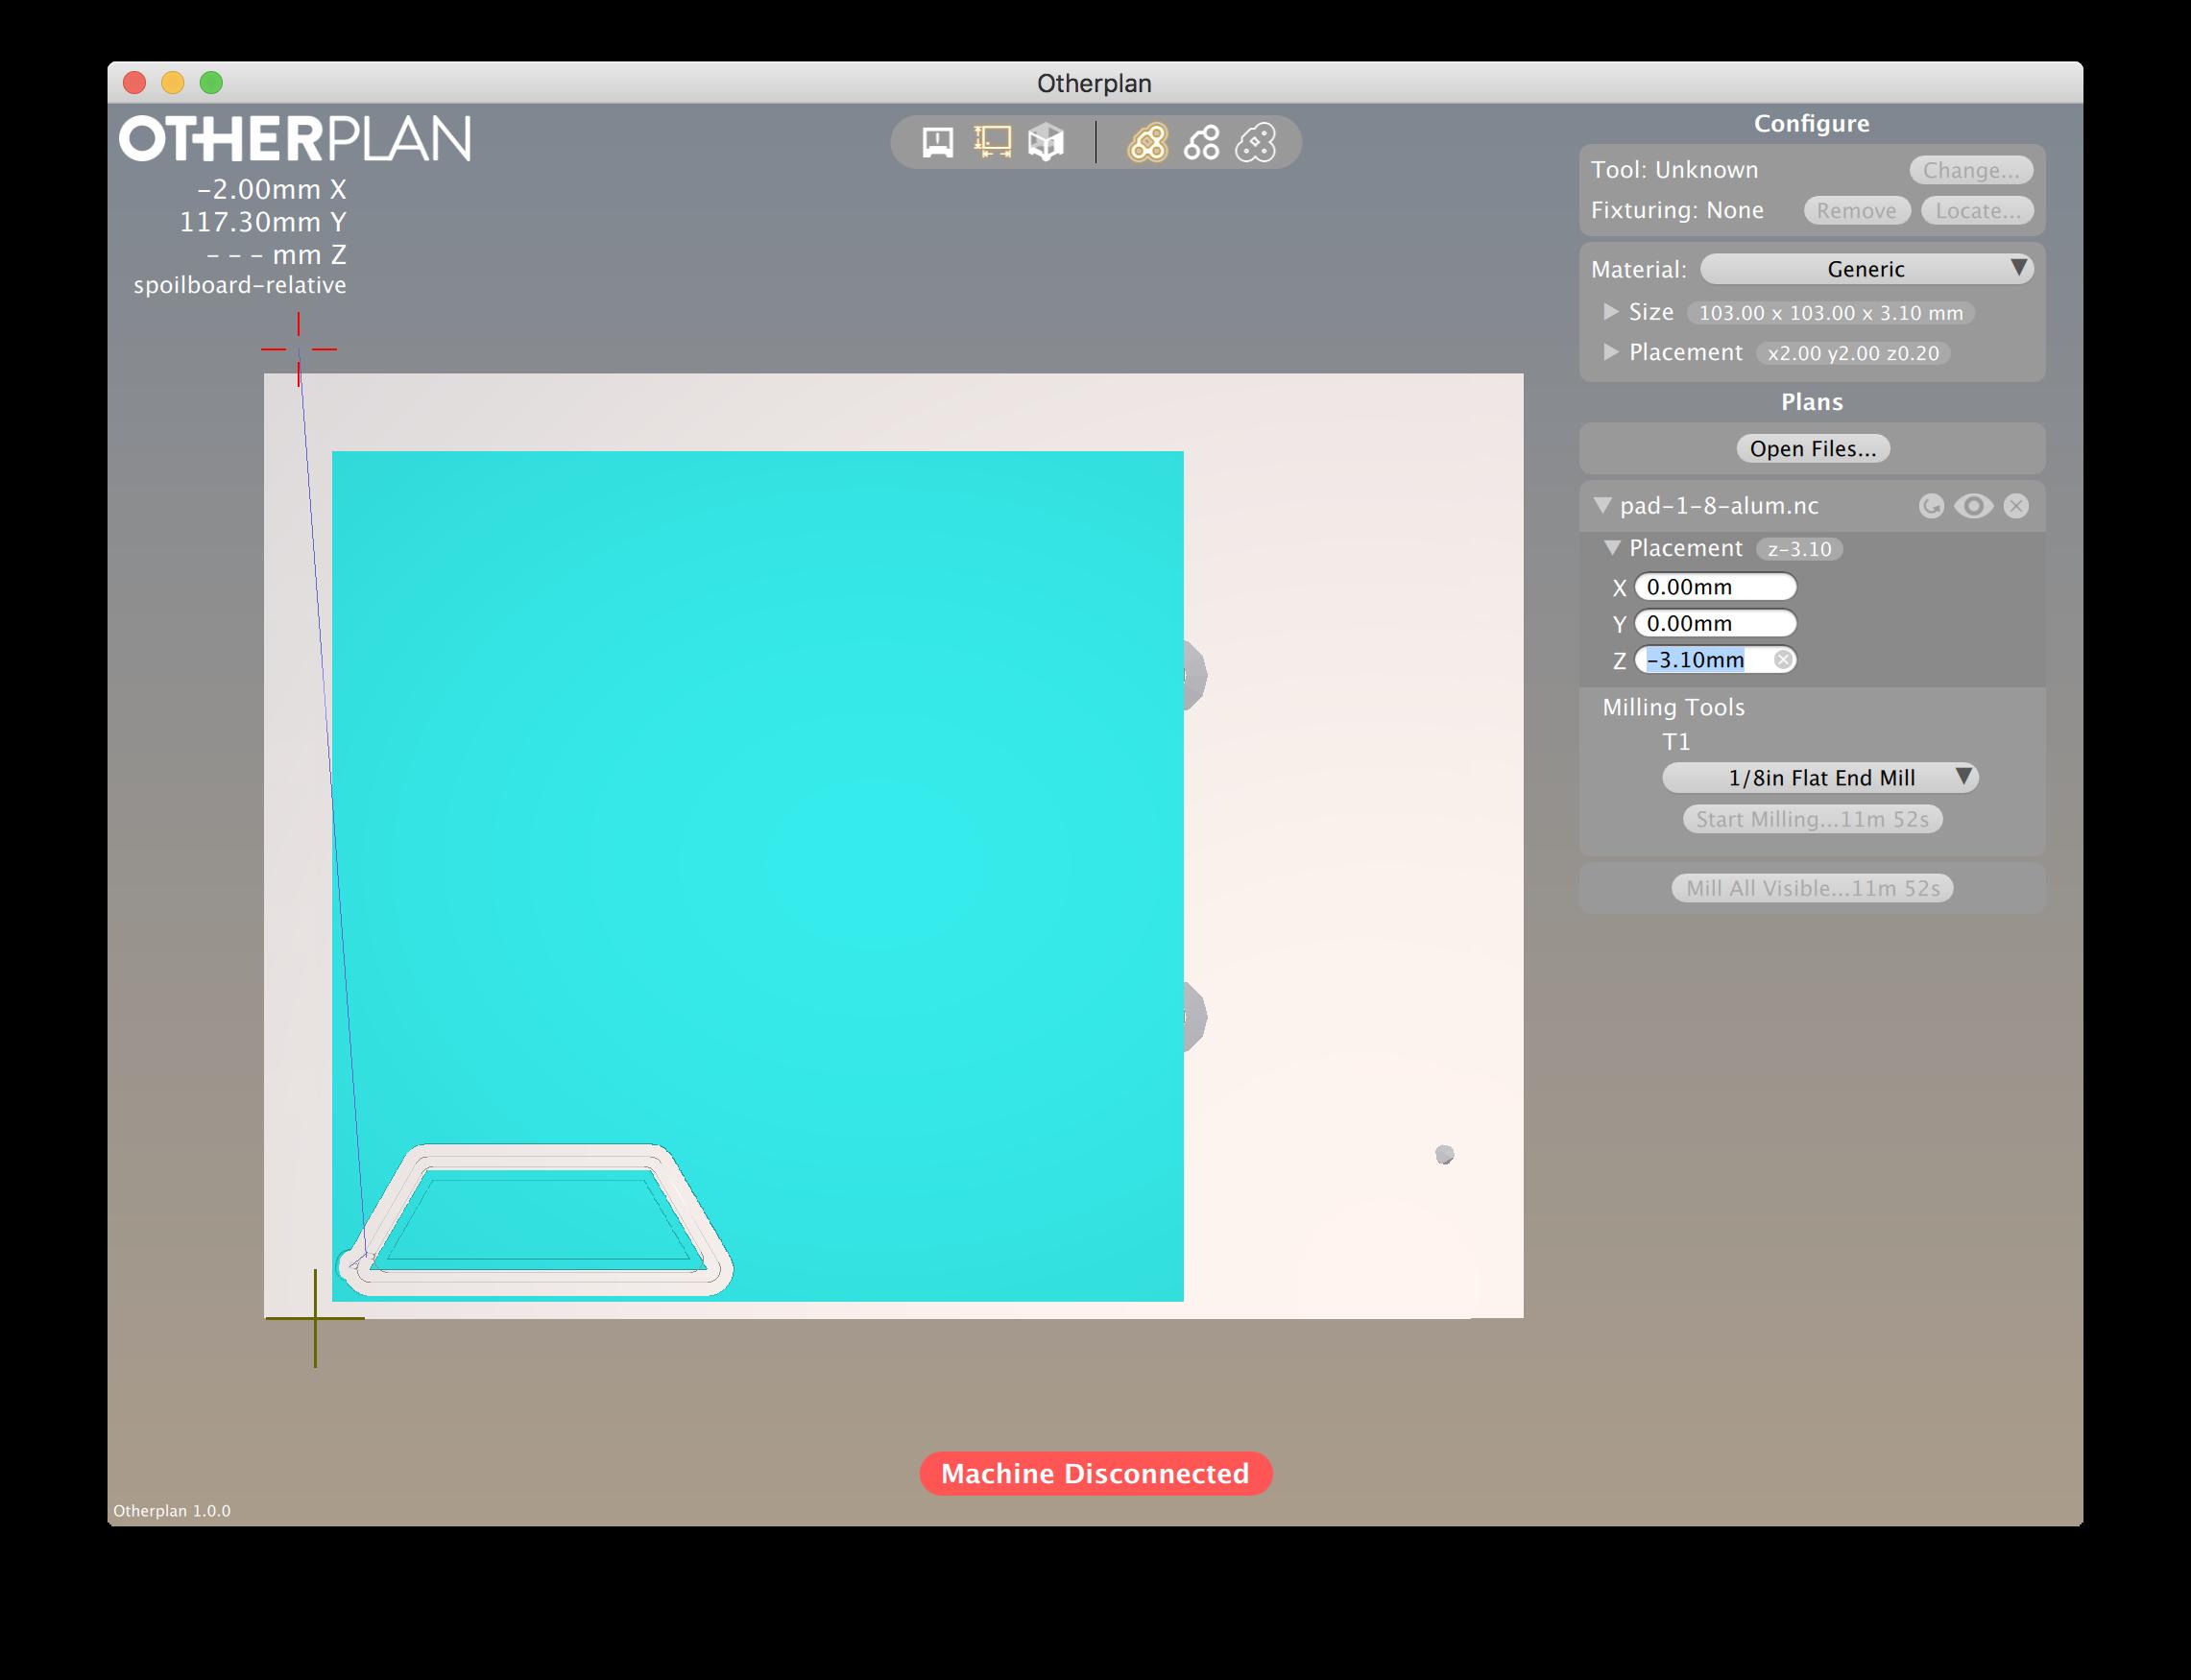 3d_printing_otherplan-1.png